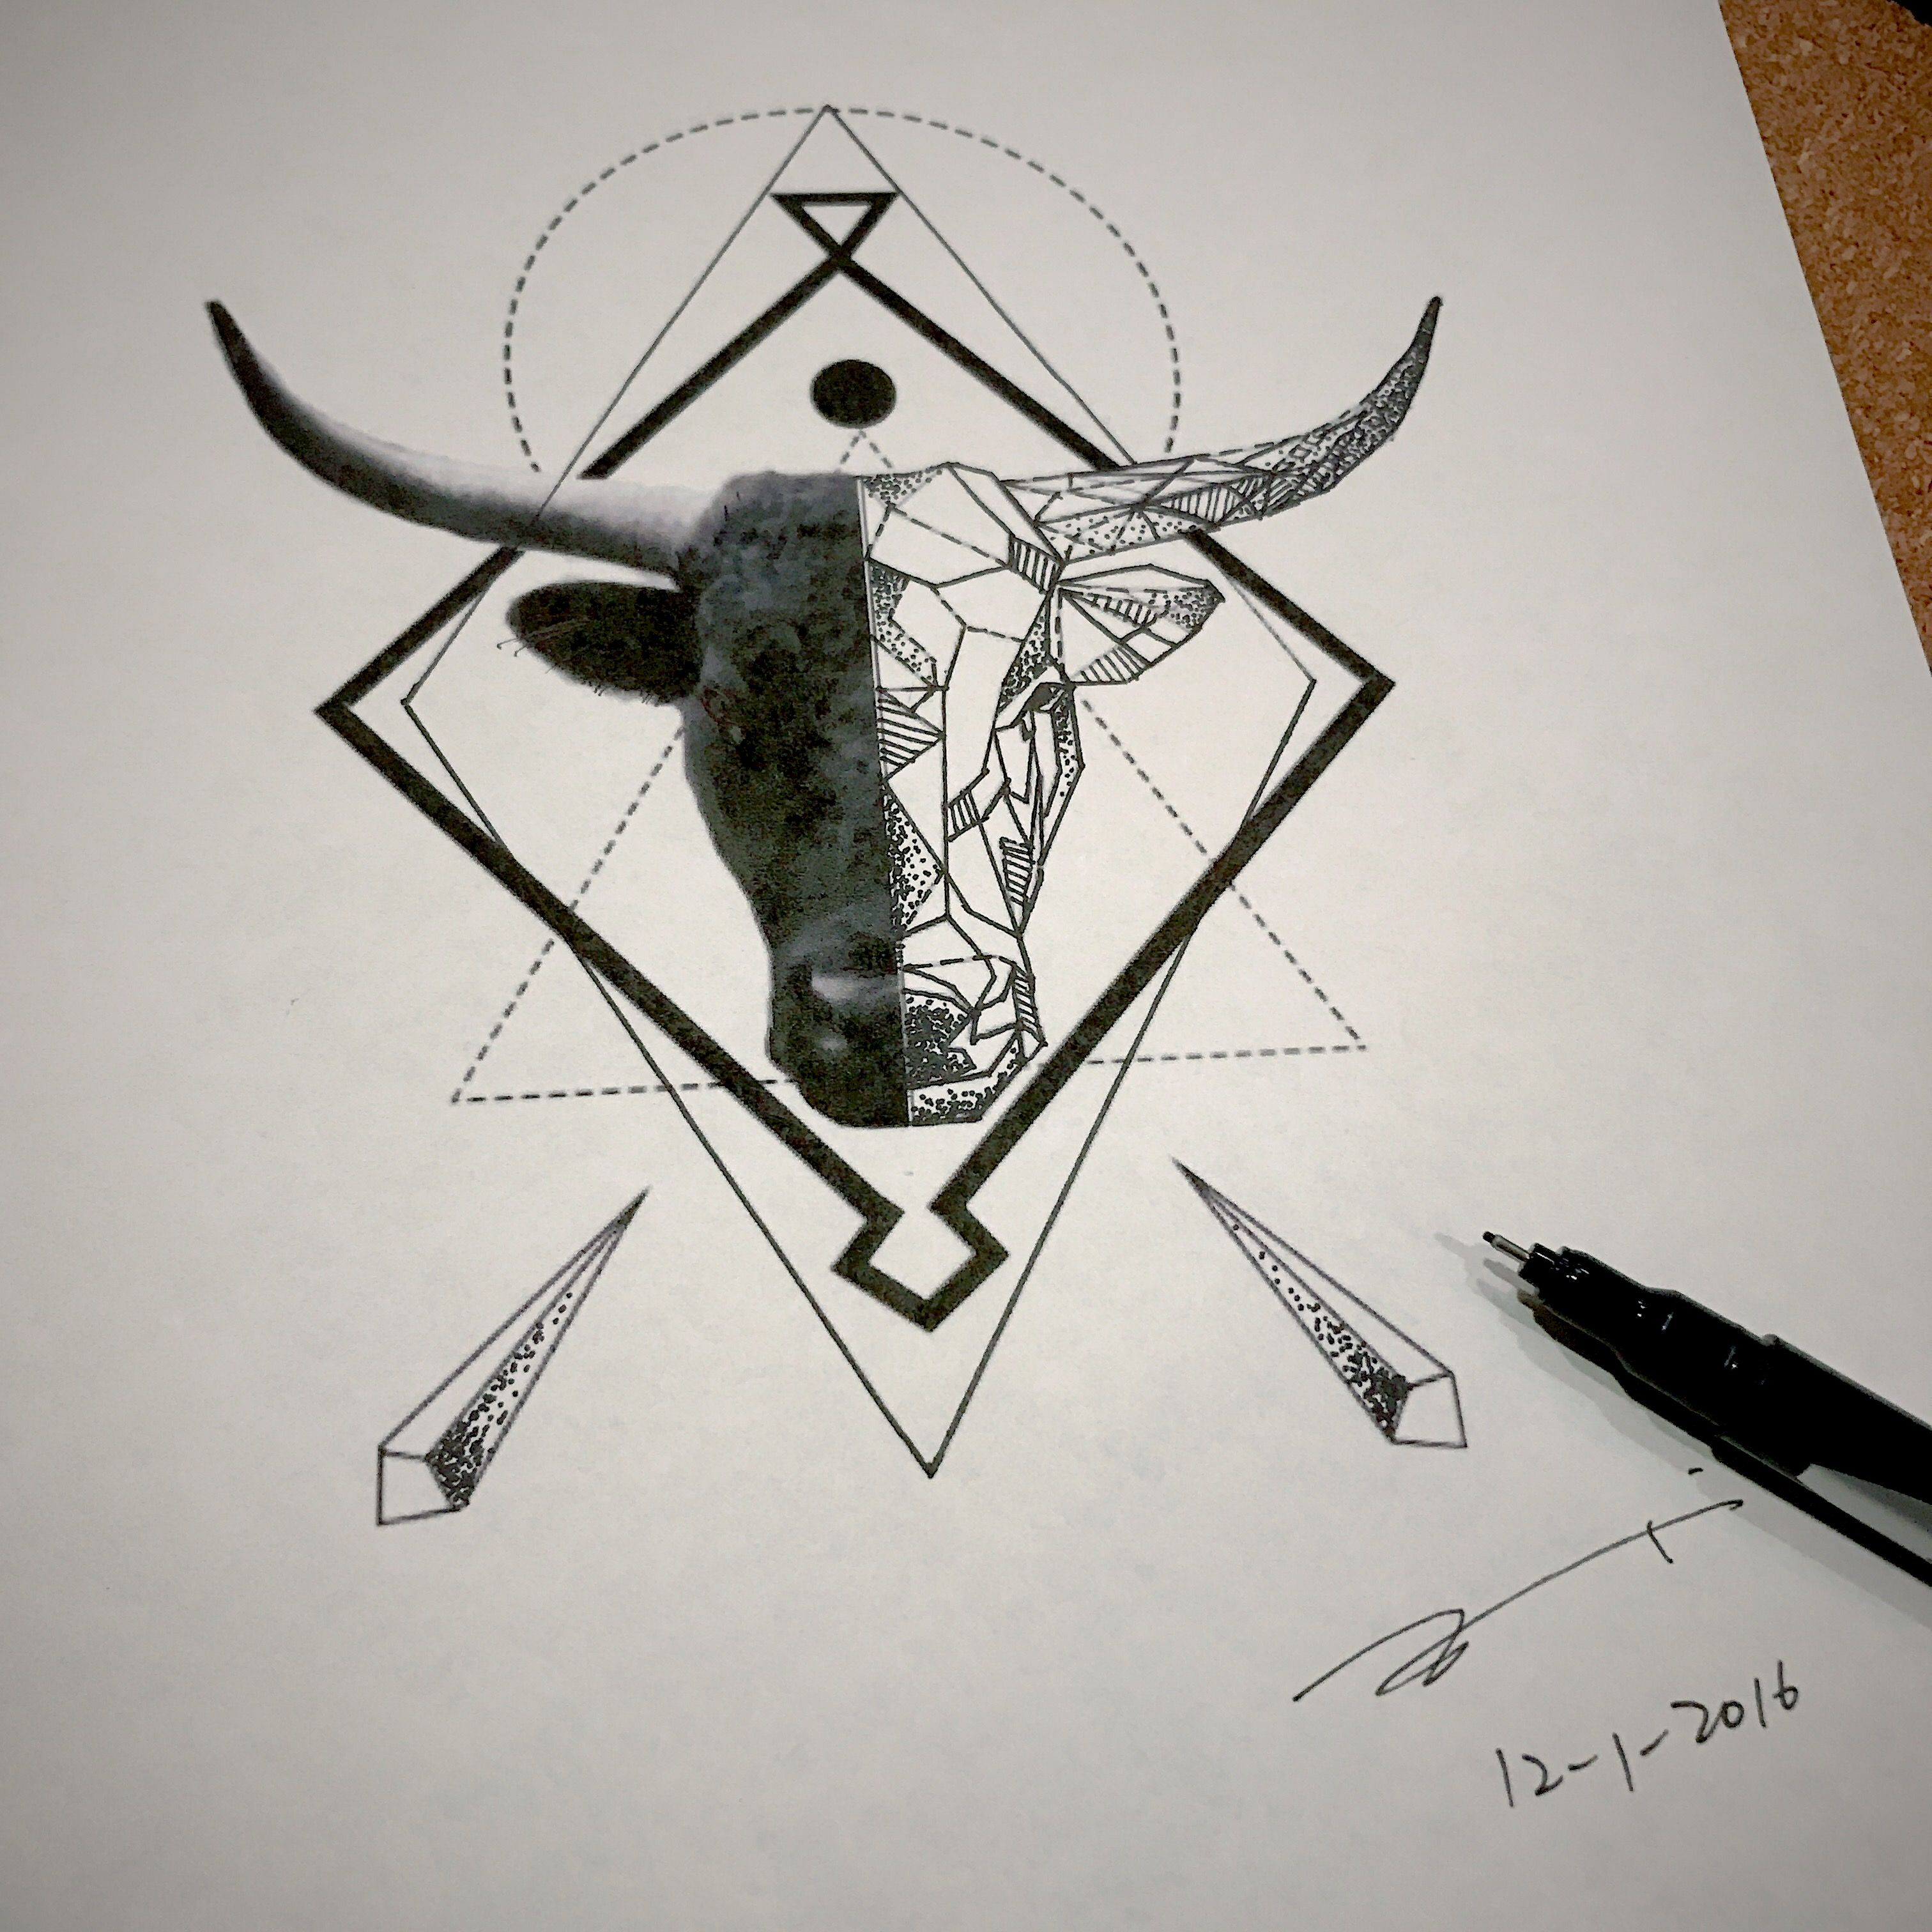 Pics photos taurus tattoos bull tattoo art - Geometric Bull Head Tattoo Design By Esther C Because There Aren T A Lot